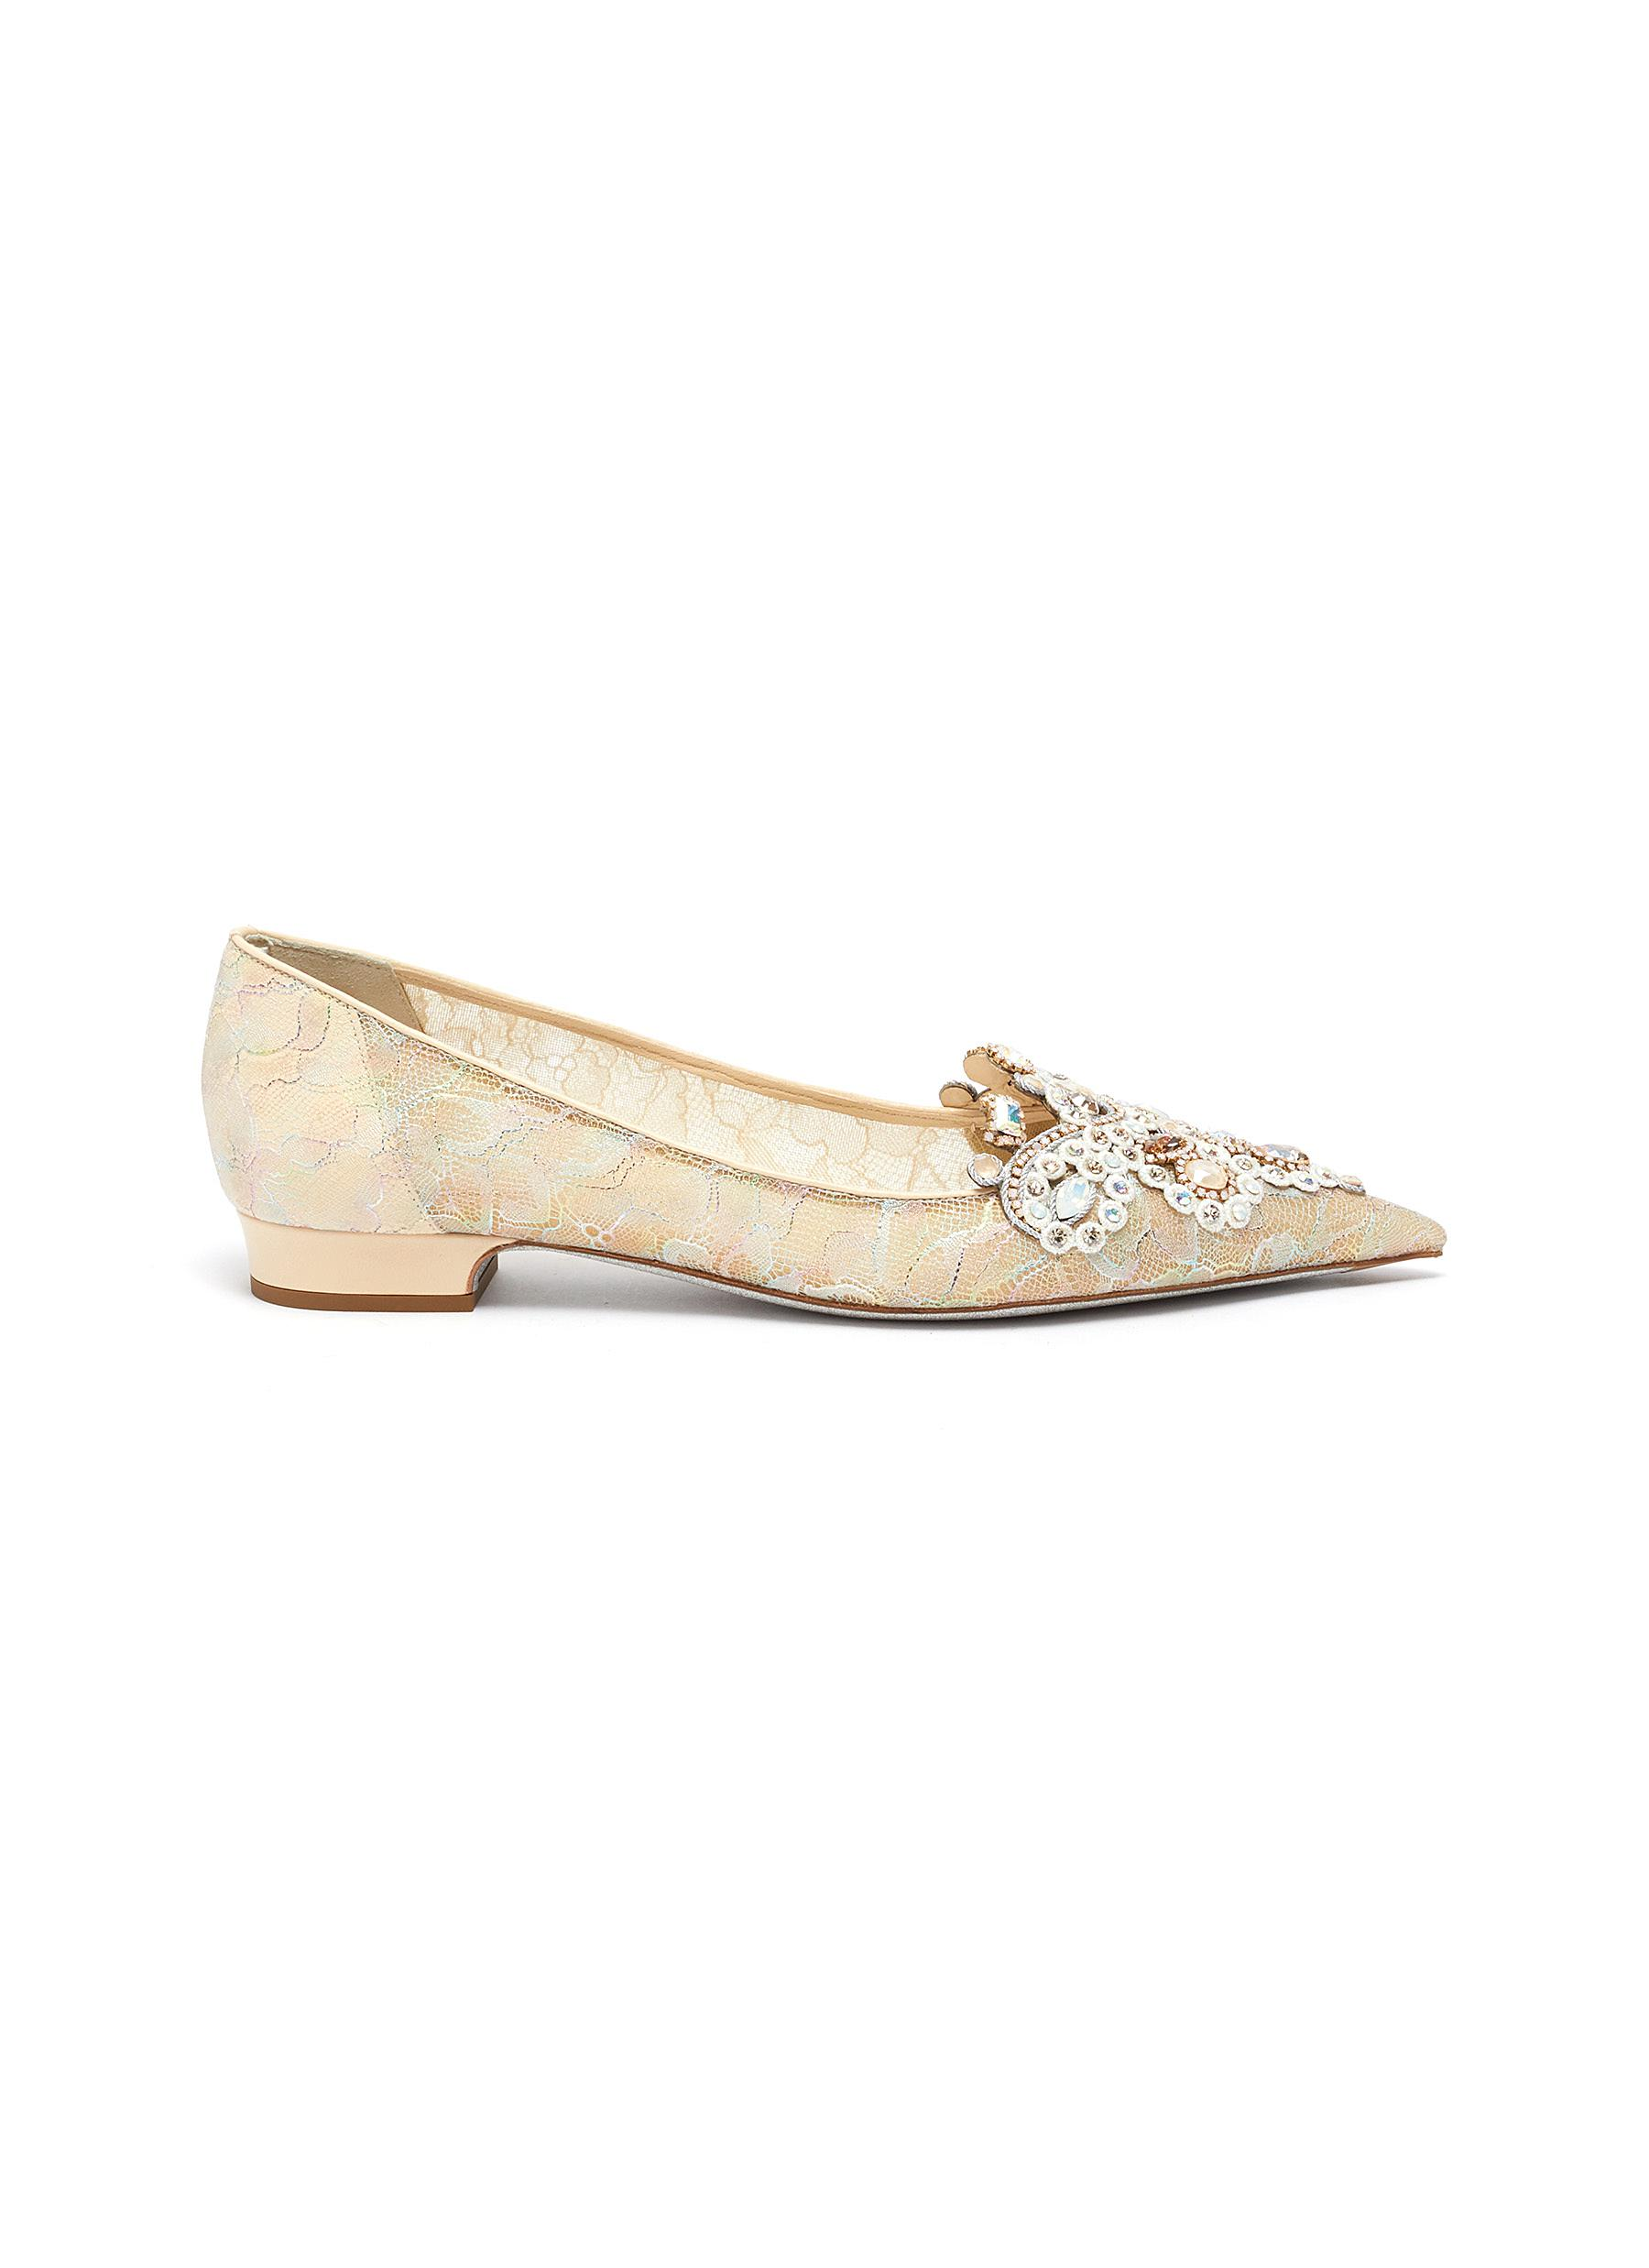 René Caovilla Flats Veneziana rose water opal and gold crystals embellished lace flats